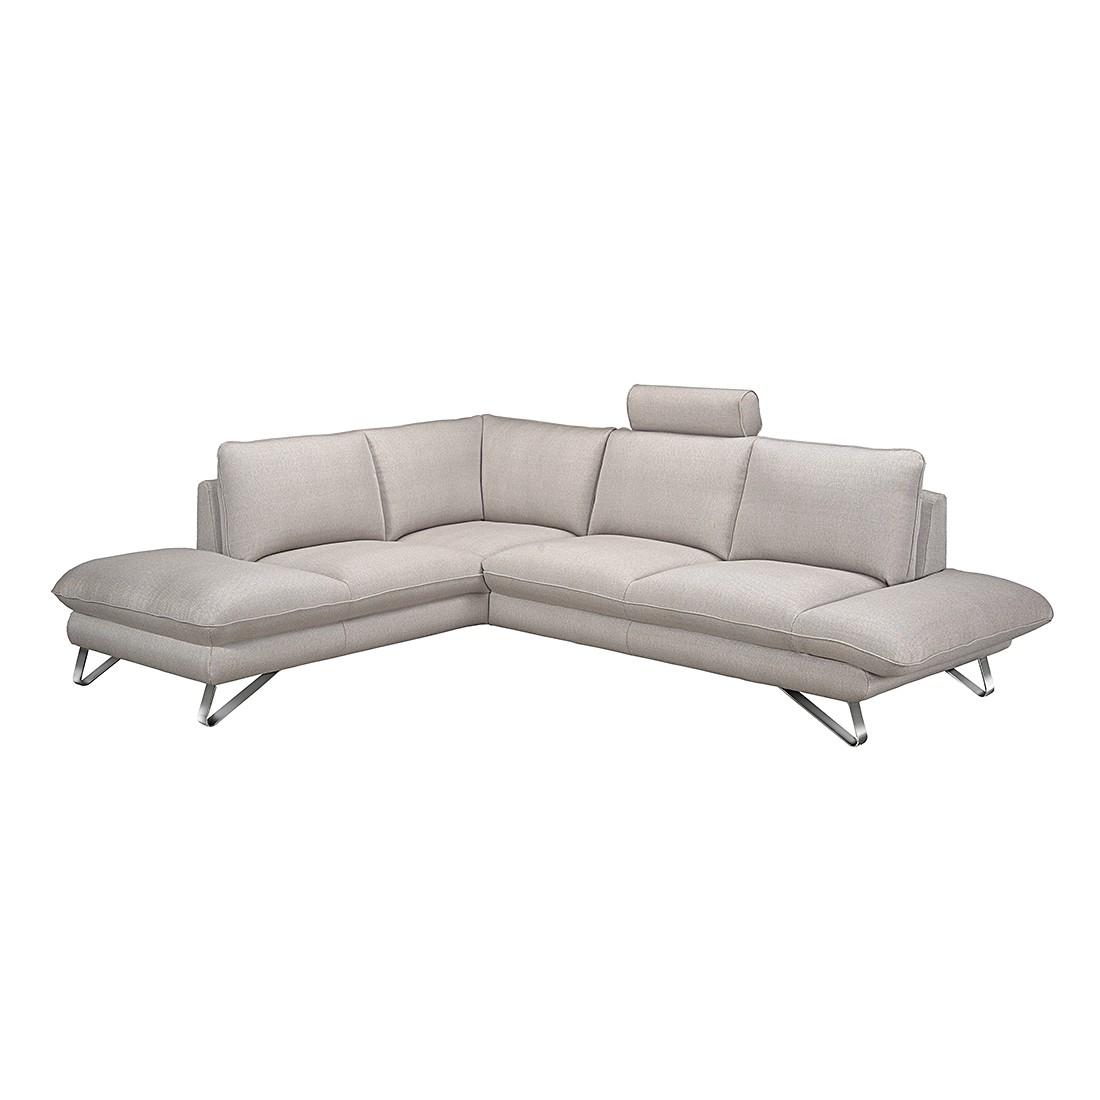 home24 Fredriks Ecksofa Enzo 2,5-Sitzer Beige Strukturstoff 276x83x220 cm (BxHxT) Modern